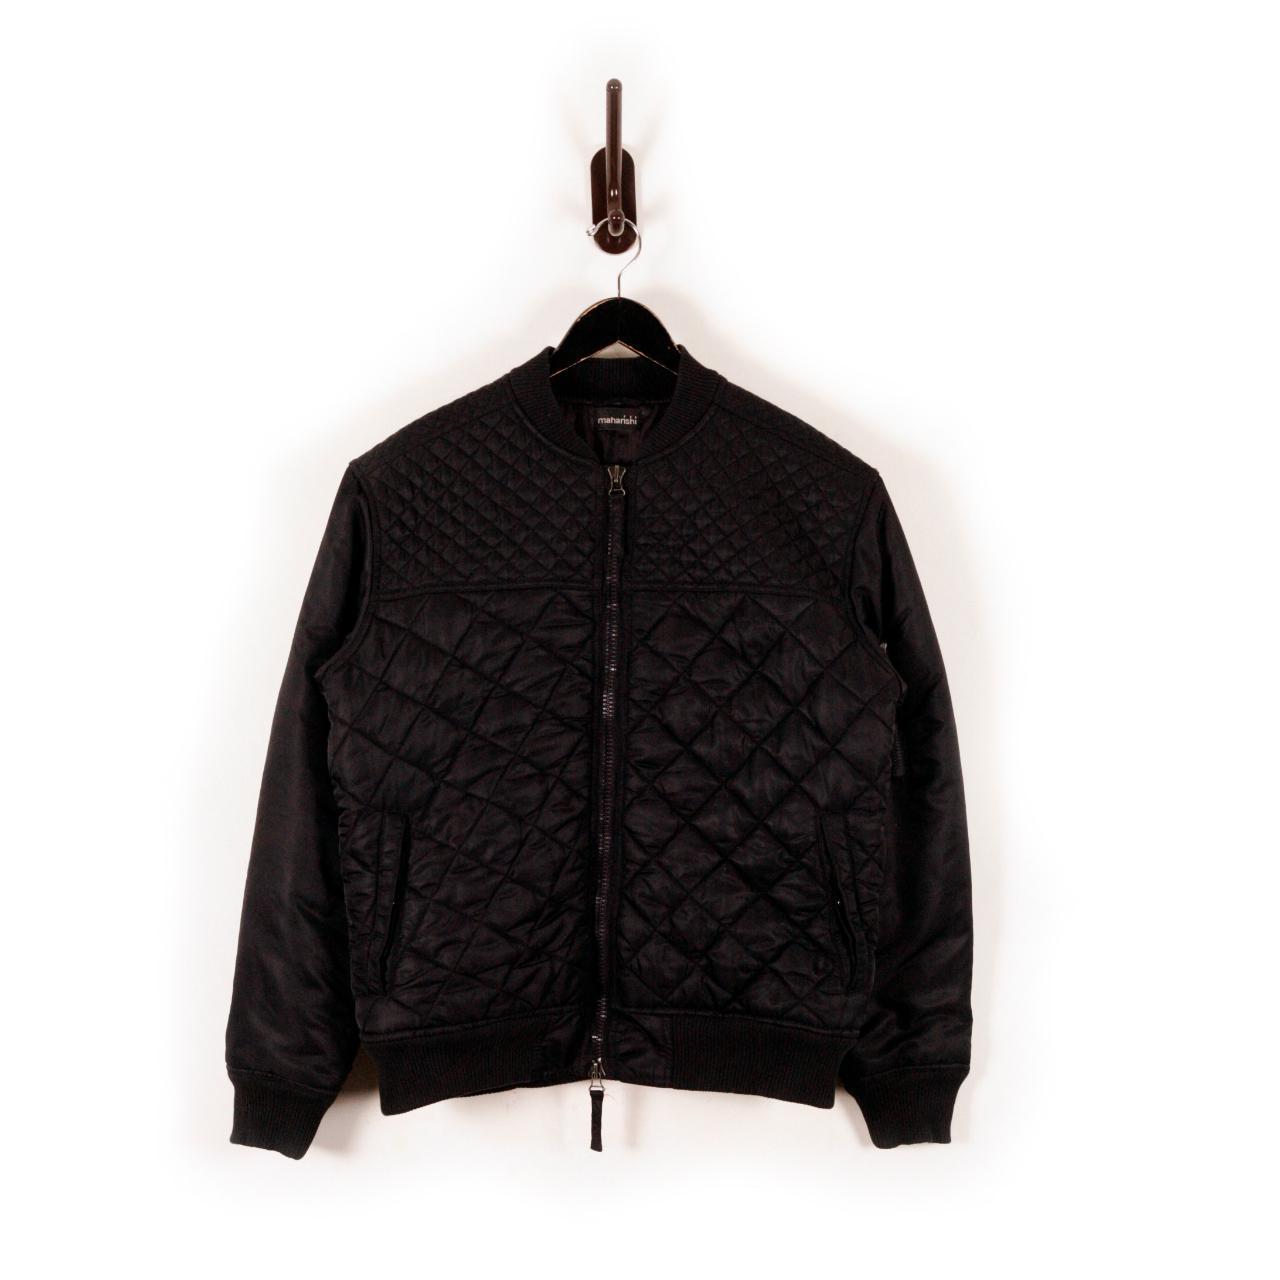 Product Image 1 - Maharishi Diamond Quilted Jacket Men's